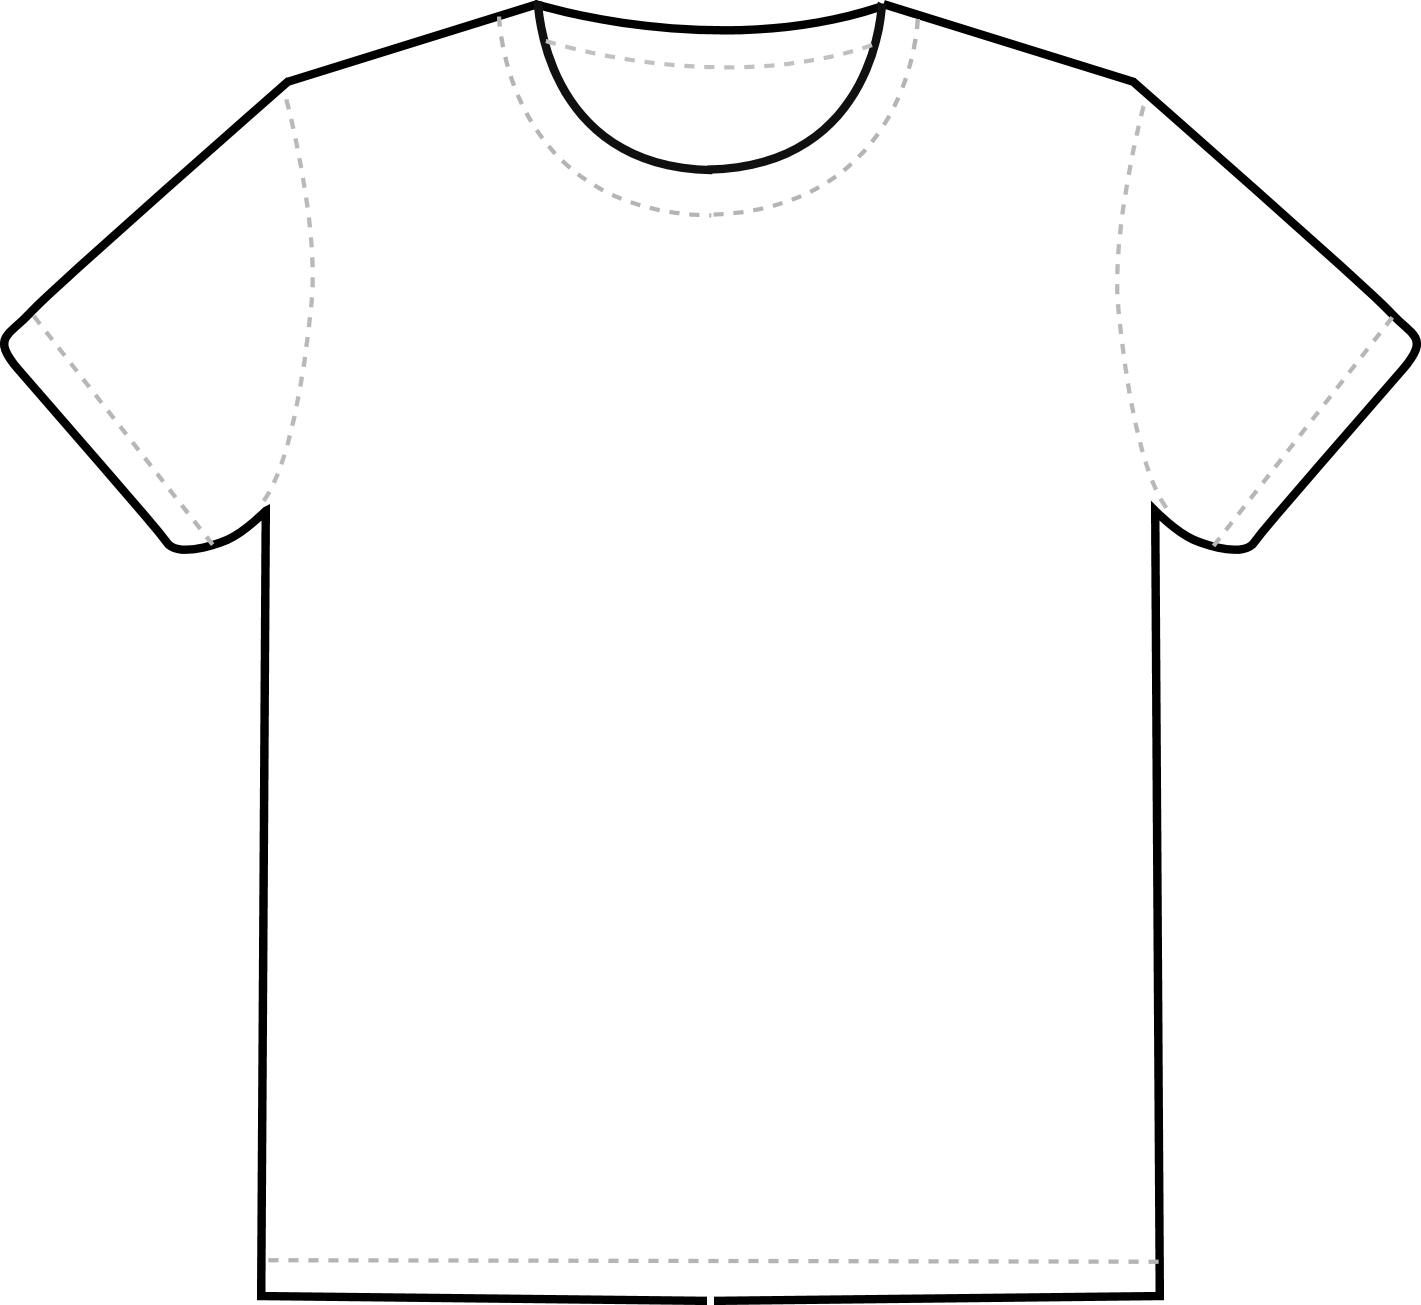 1421x1305 Shirt Clipart Black And White